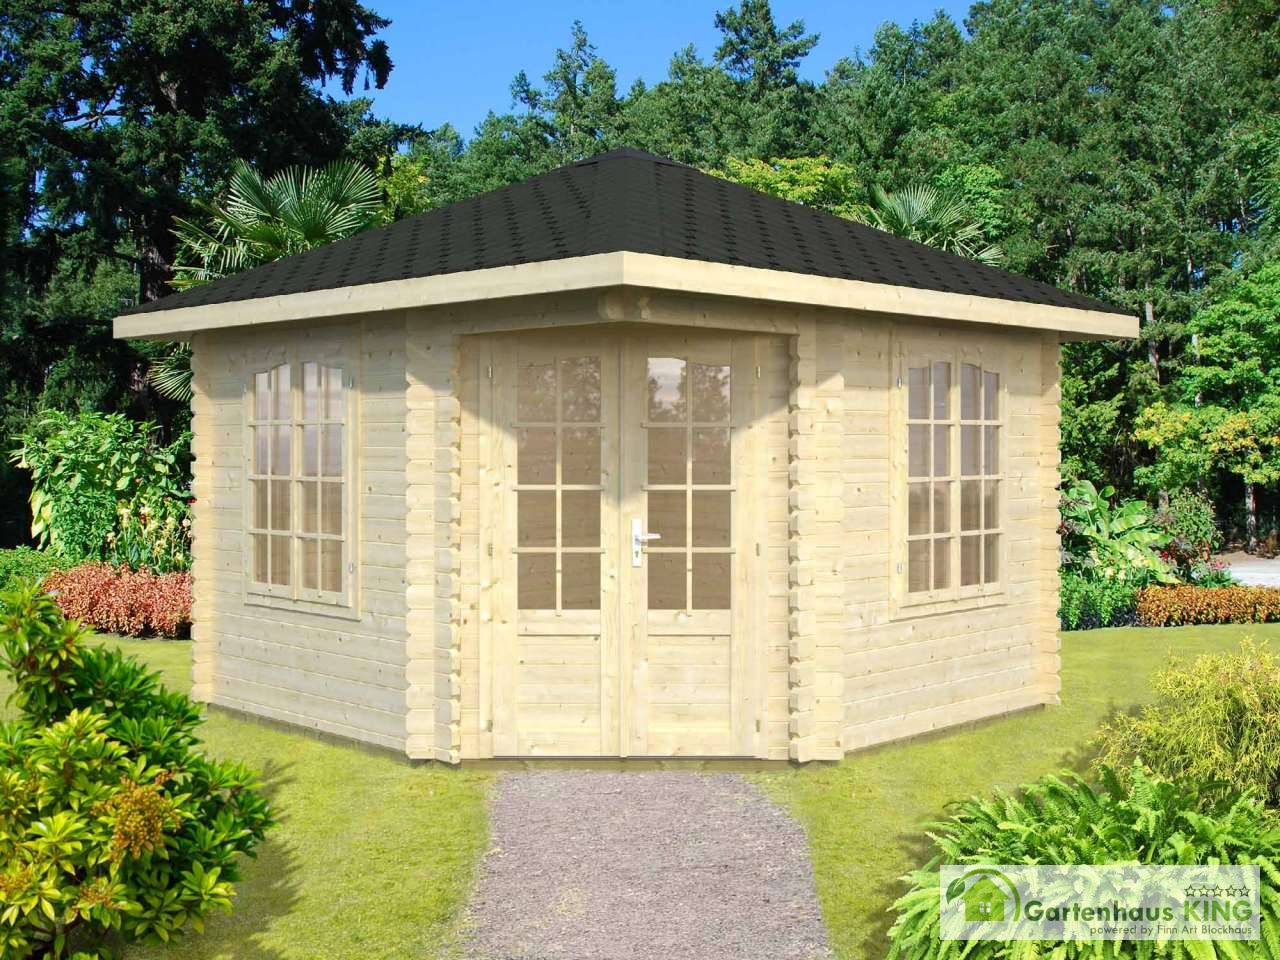 palmako 5 eck gartenhaus melanie 6 8 m gartenhaus. Black Bedroom Furniture Sets. Home Design Ideas